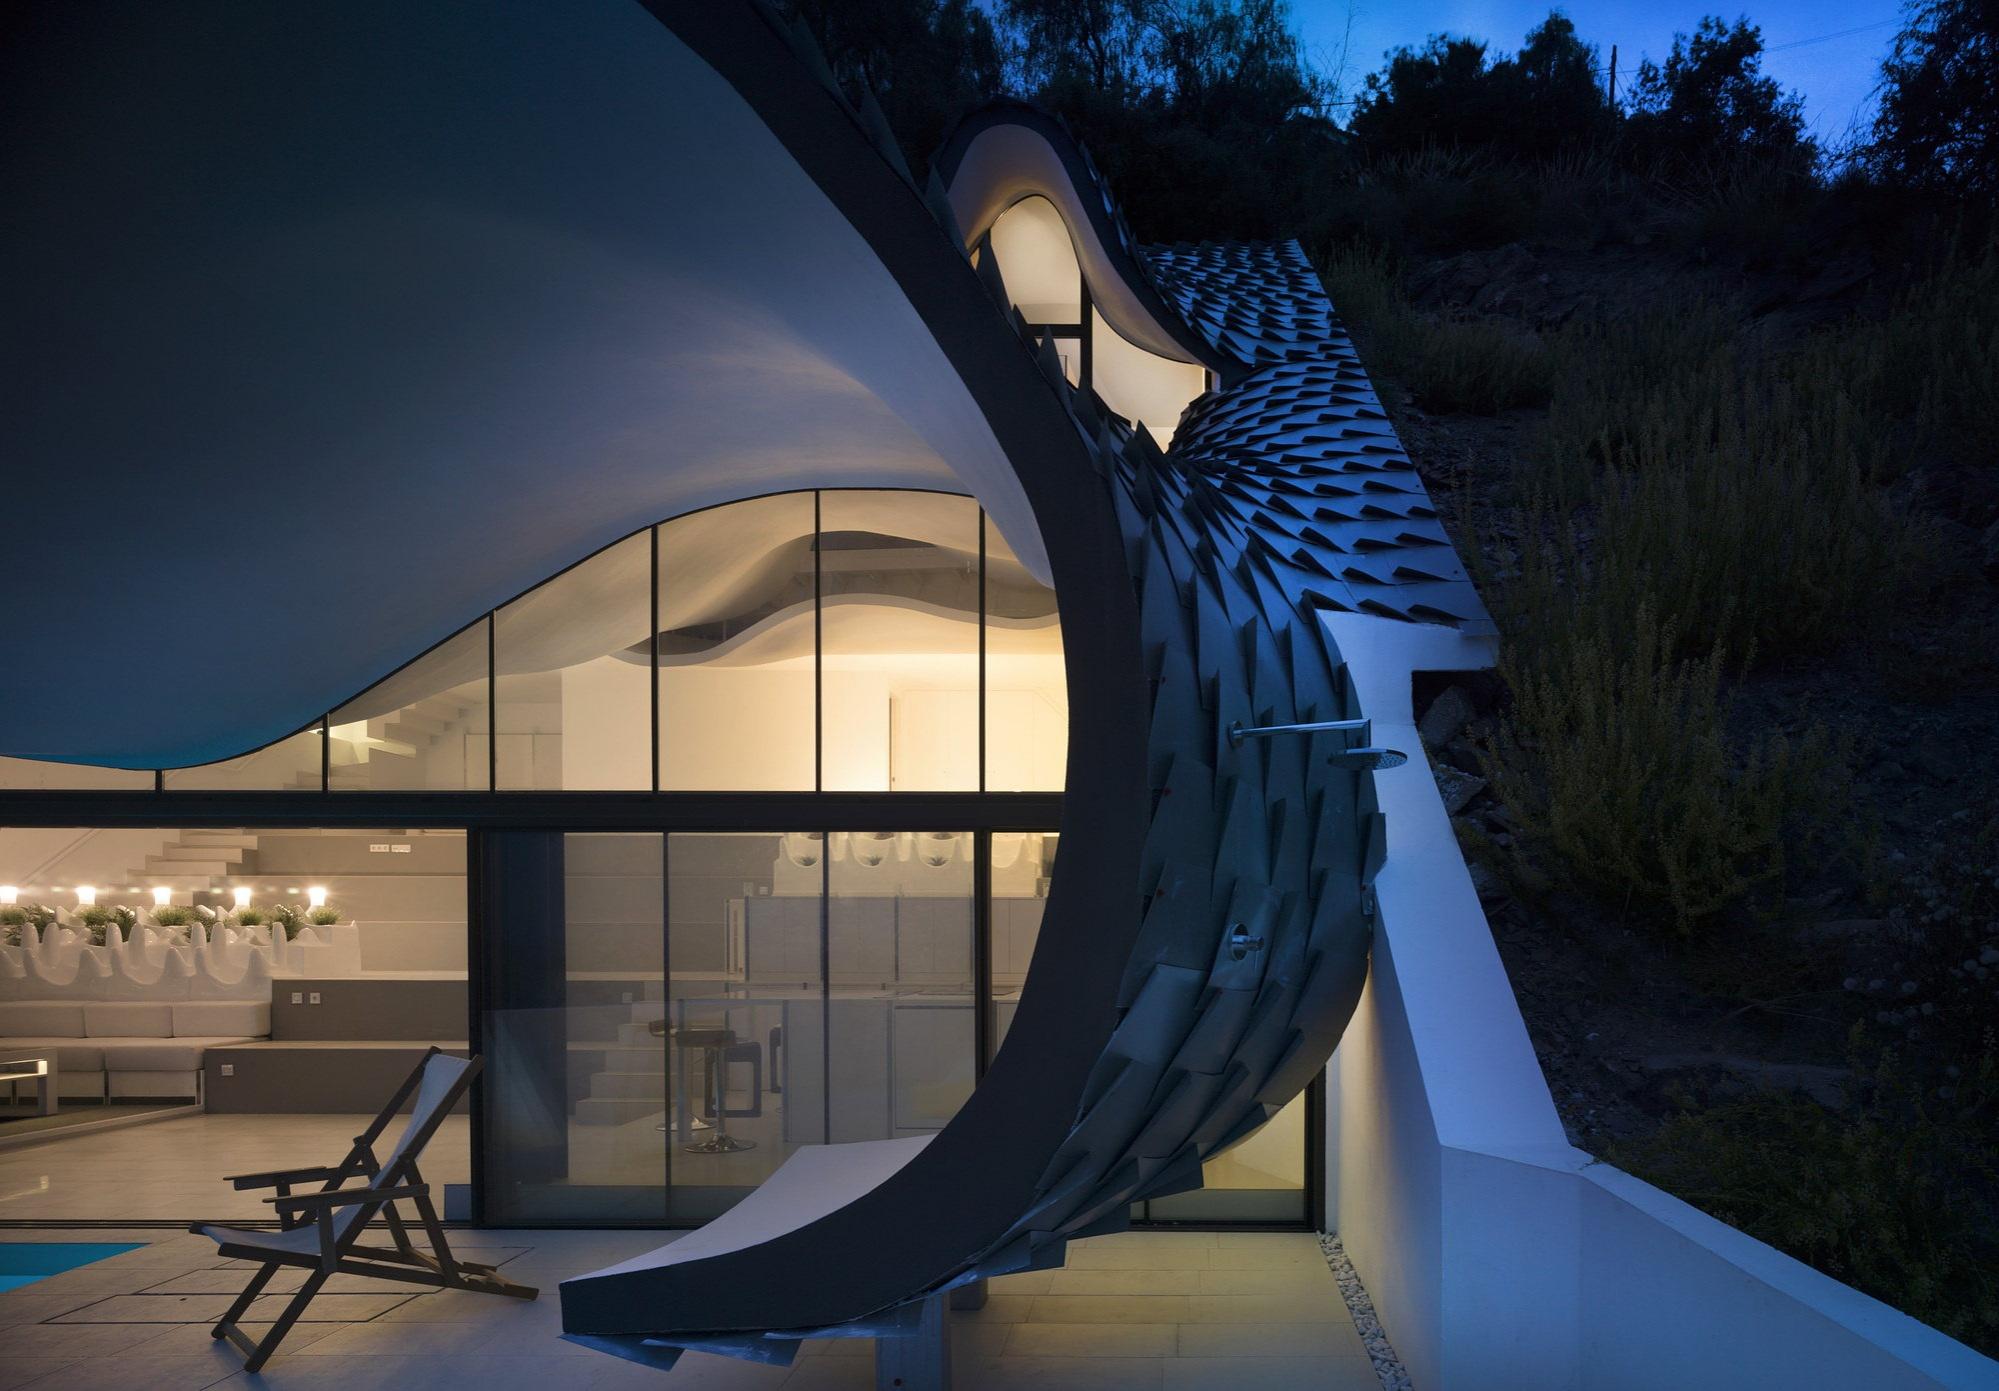 unbelievable-house-on-the-mountain-slope-overlooking-mediterranean-sea-spain-11